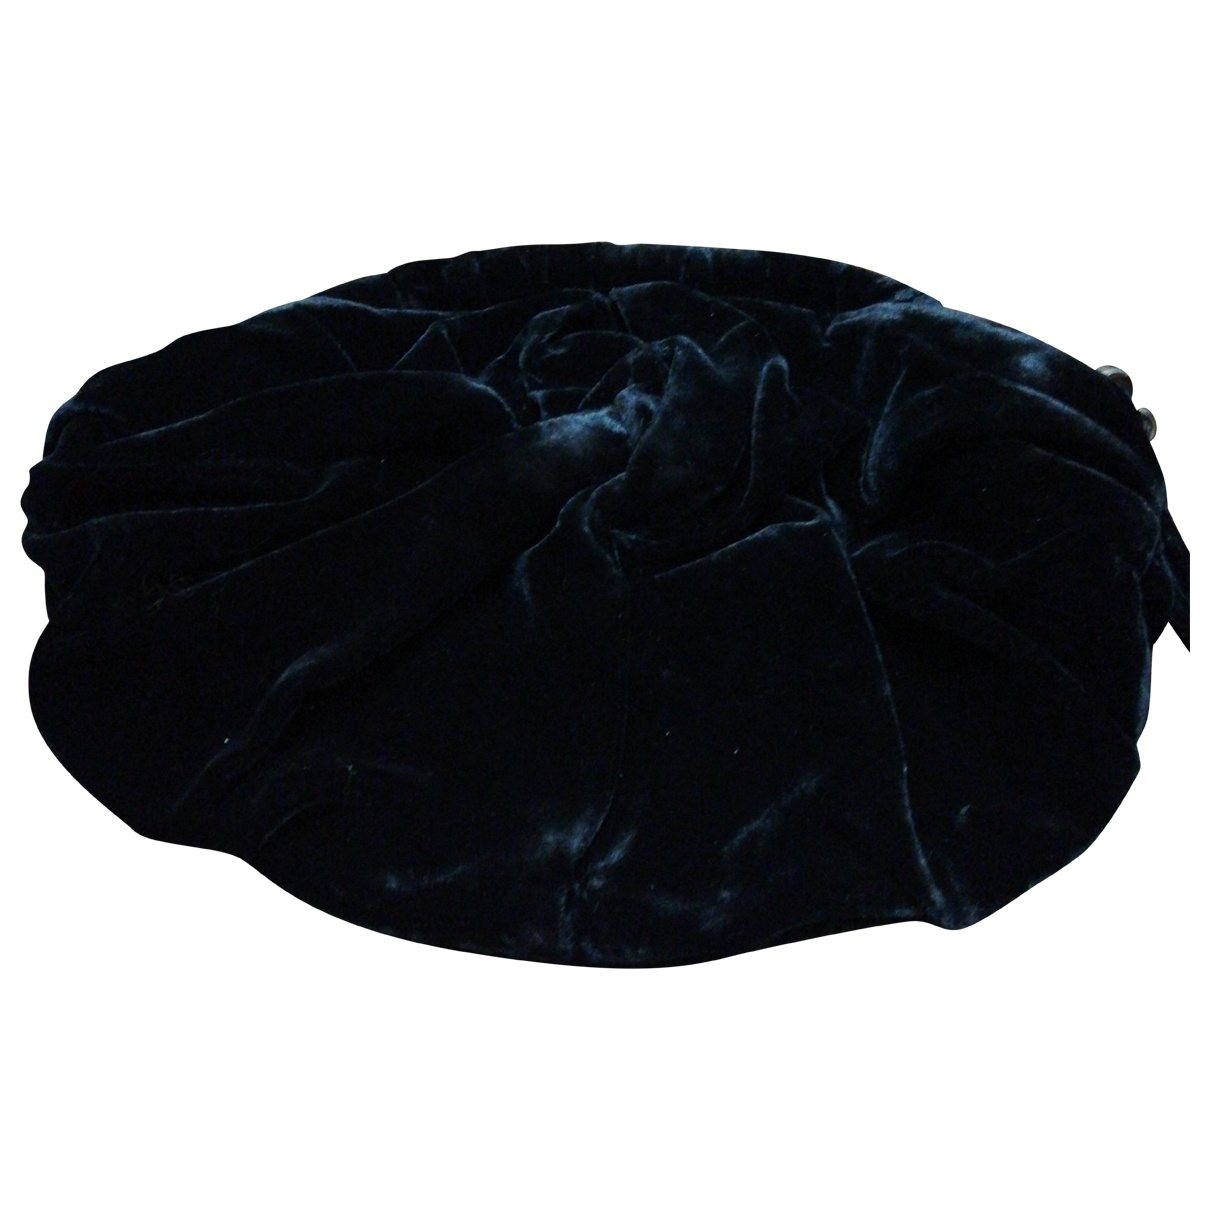 D&g - Pochette   pour femme en velours - noir